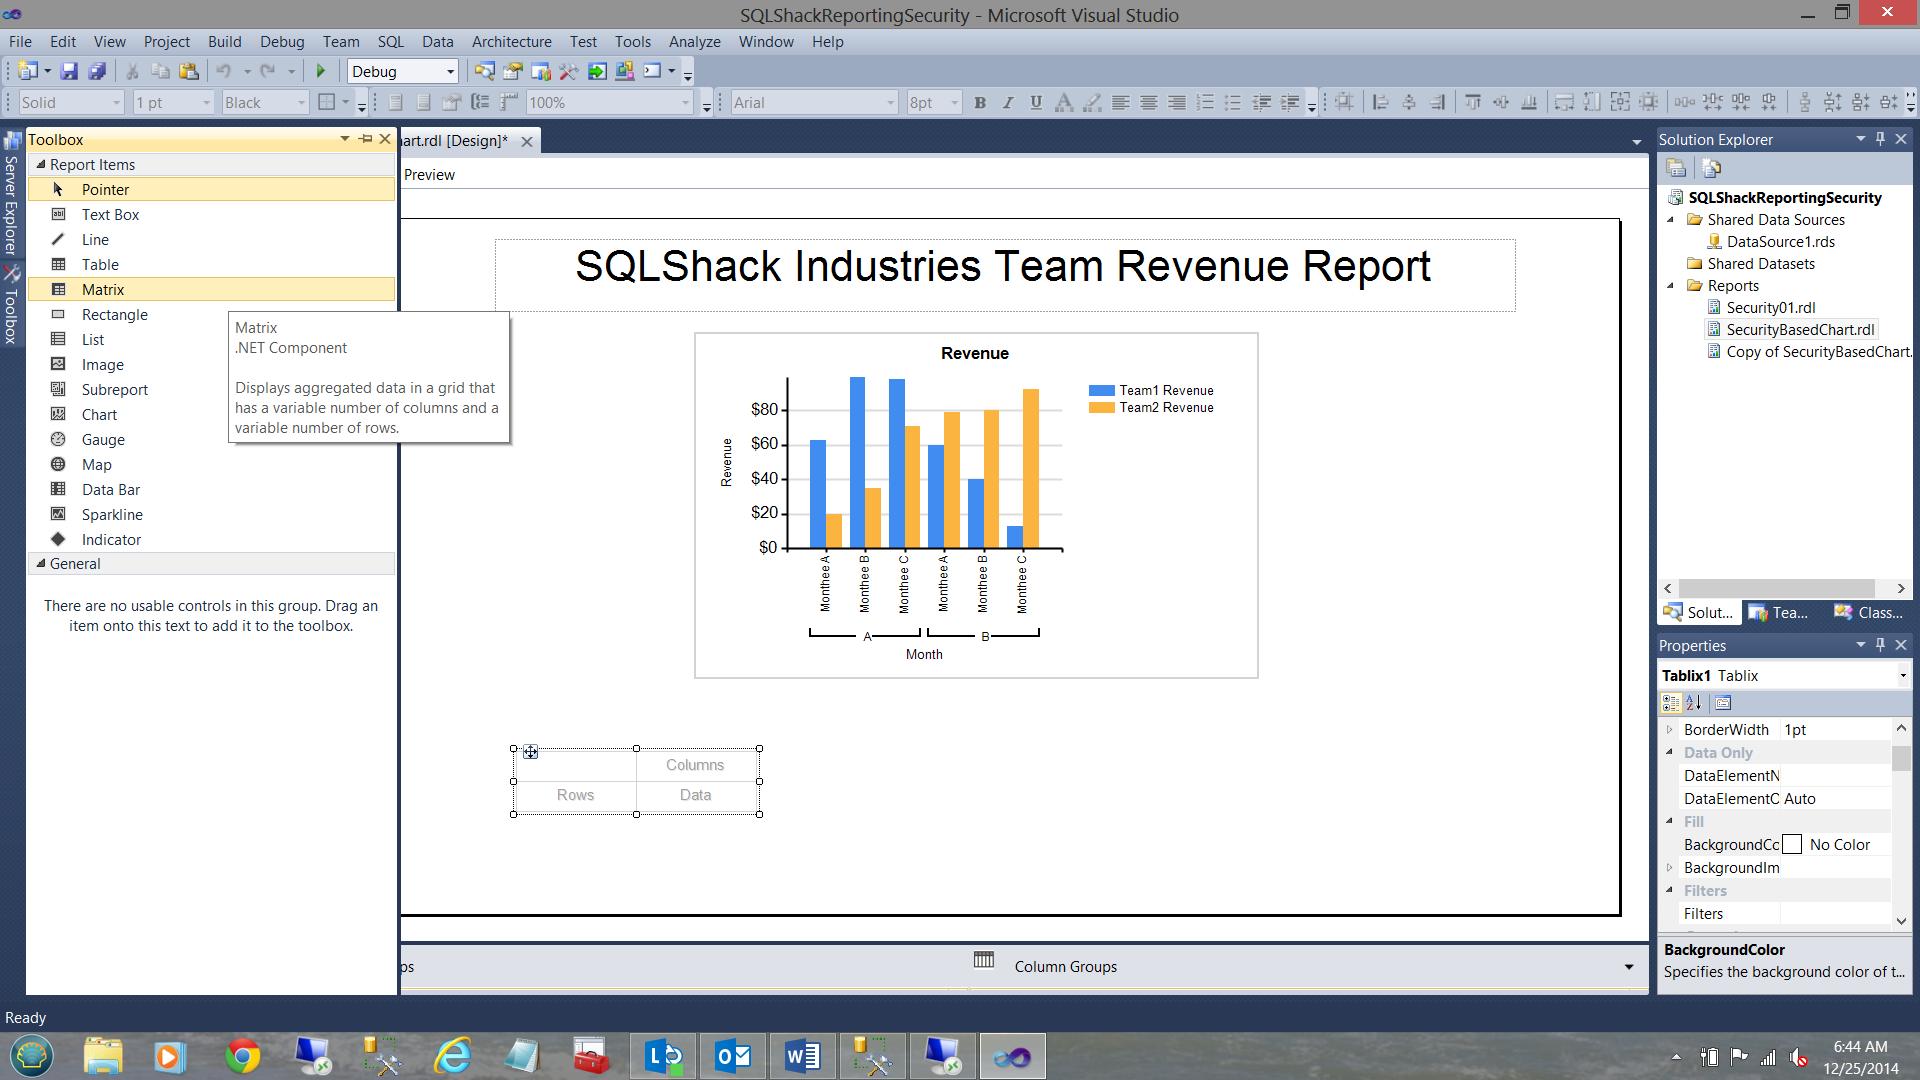 SQL Server安全机制–如何控制用户能够在报告中查看哪些数据35